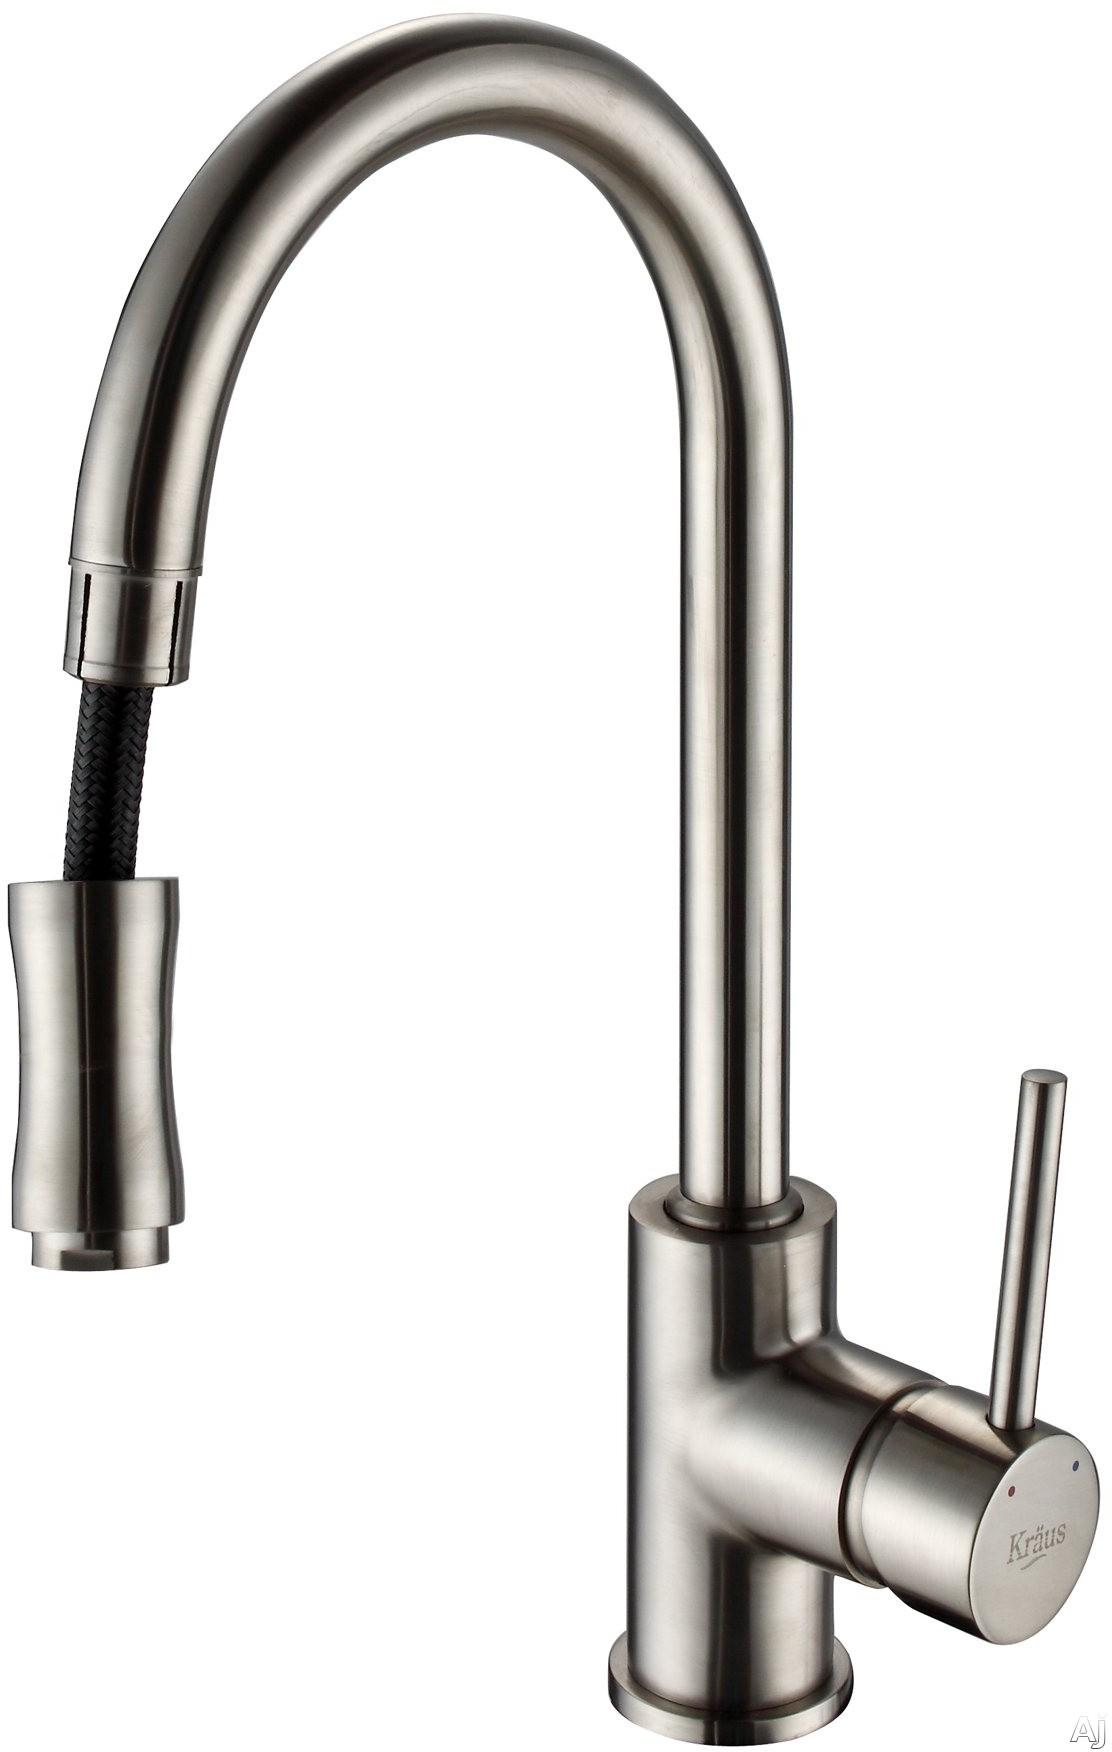 Kraus Kpf1622ksd30sn Single Lever Pull Out Kitchen Faucet